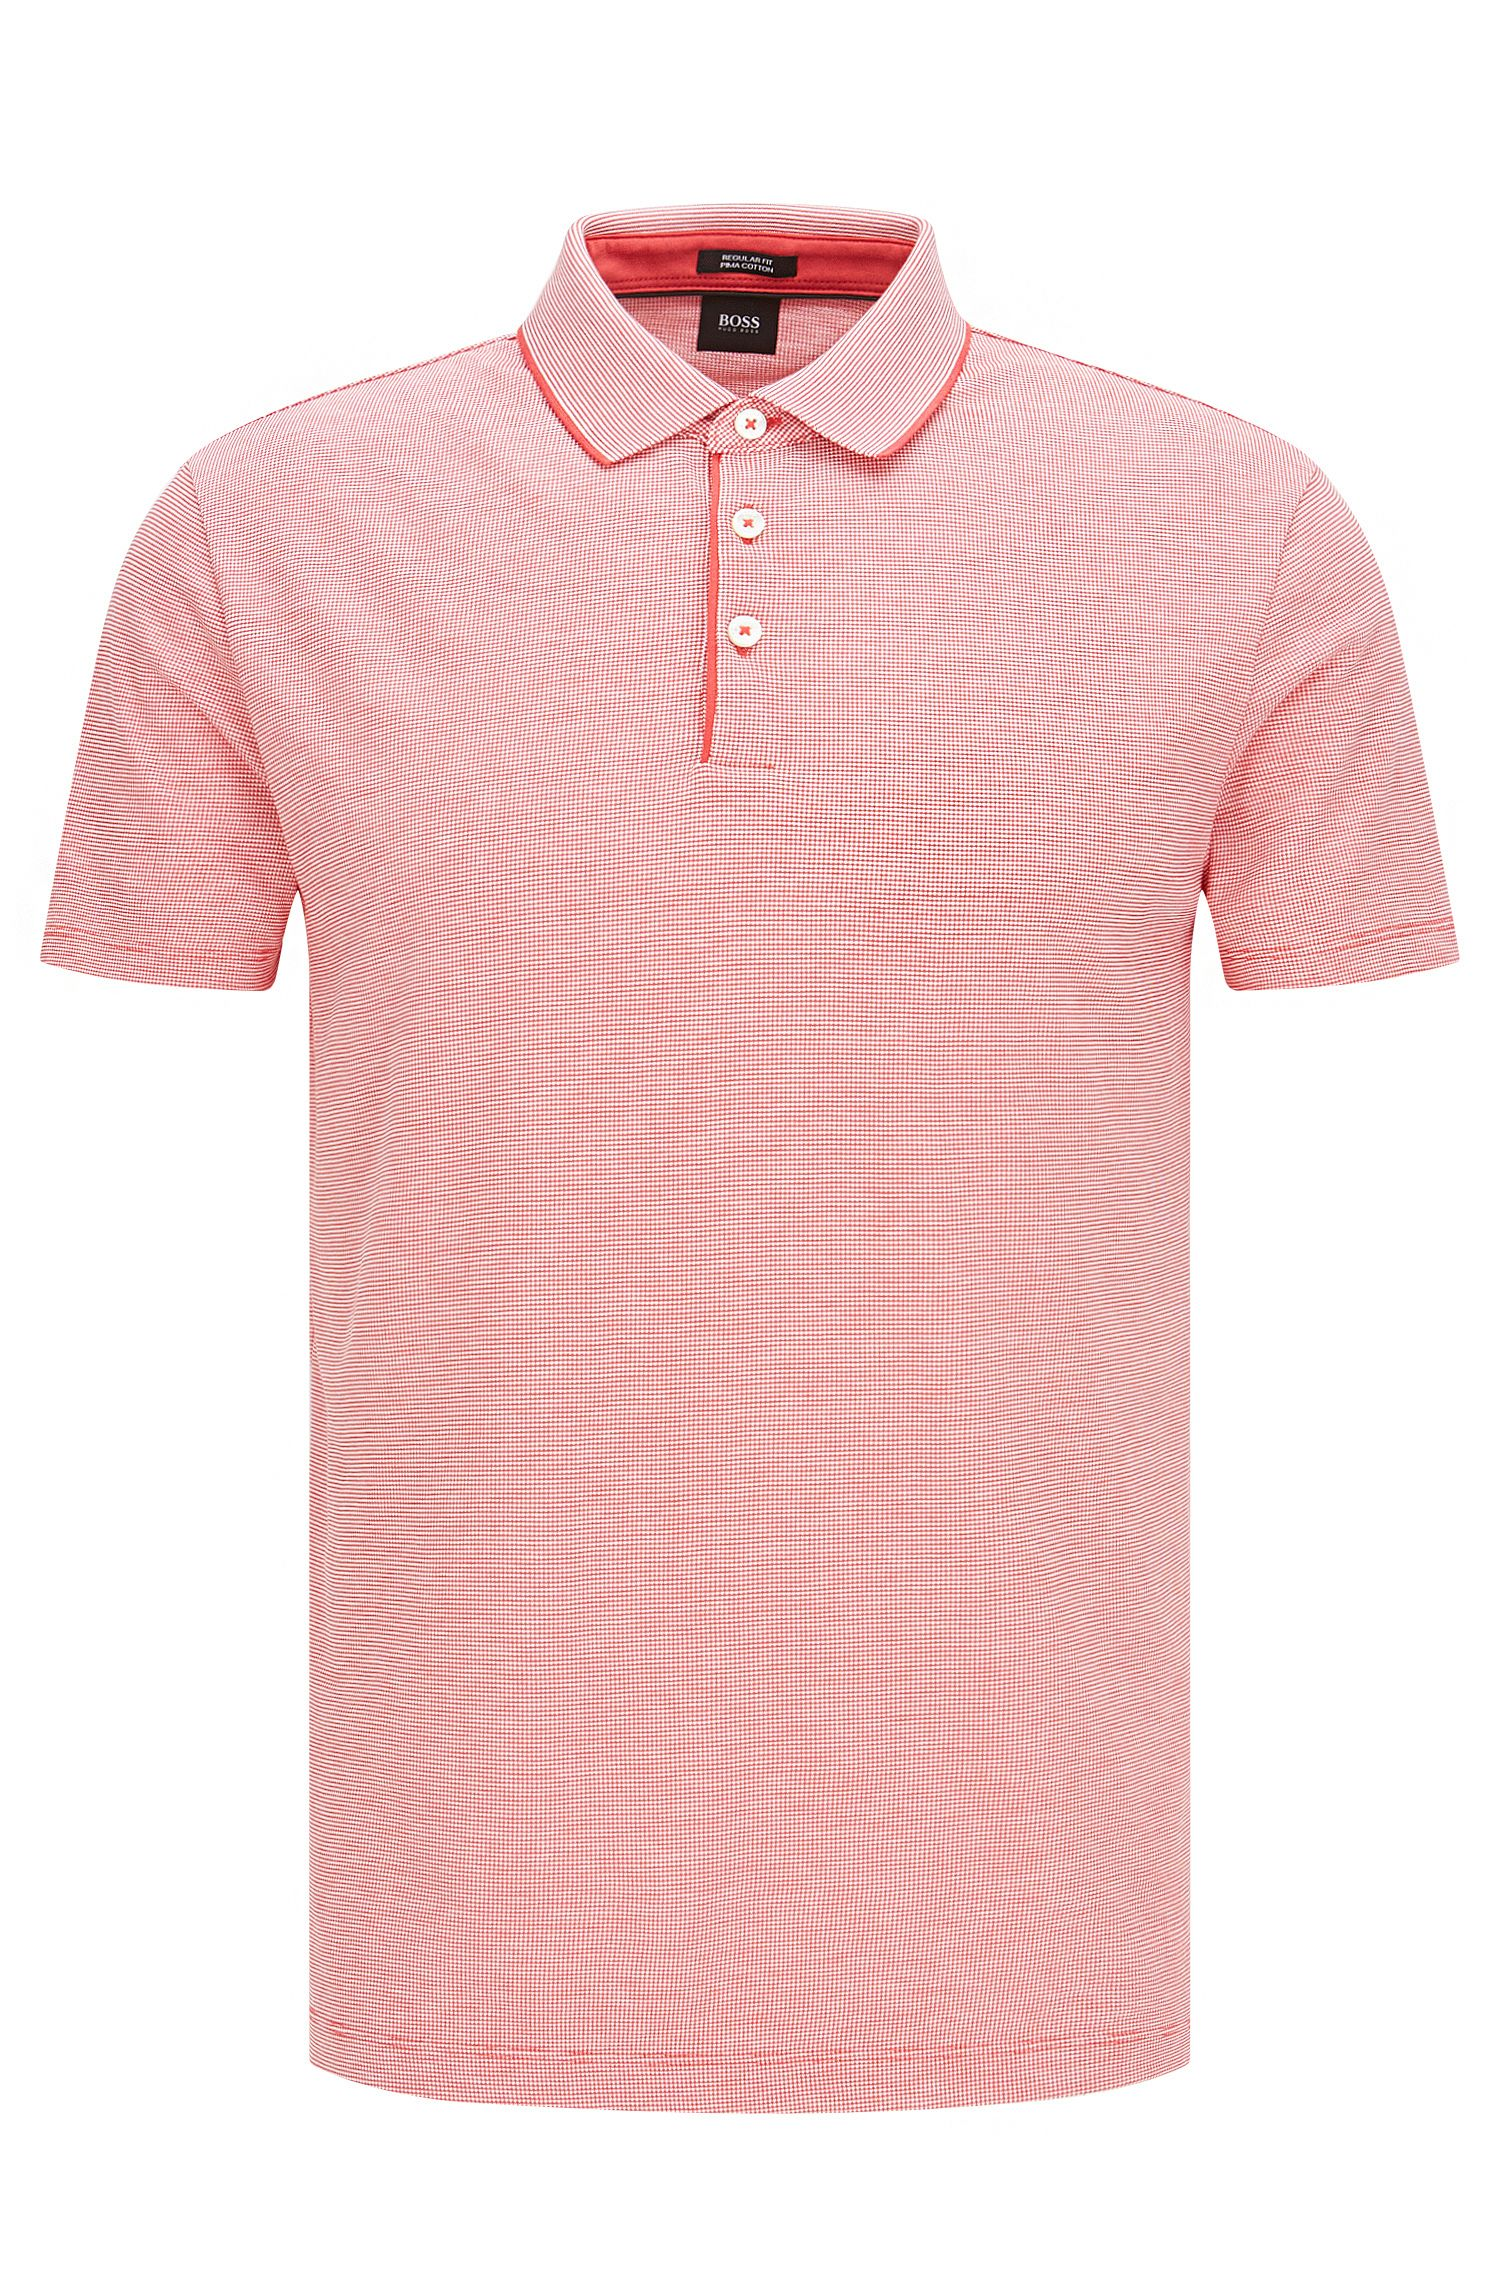 'Pack' | Regular Fit, Pima Cotton Polo Shirt